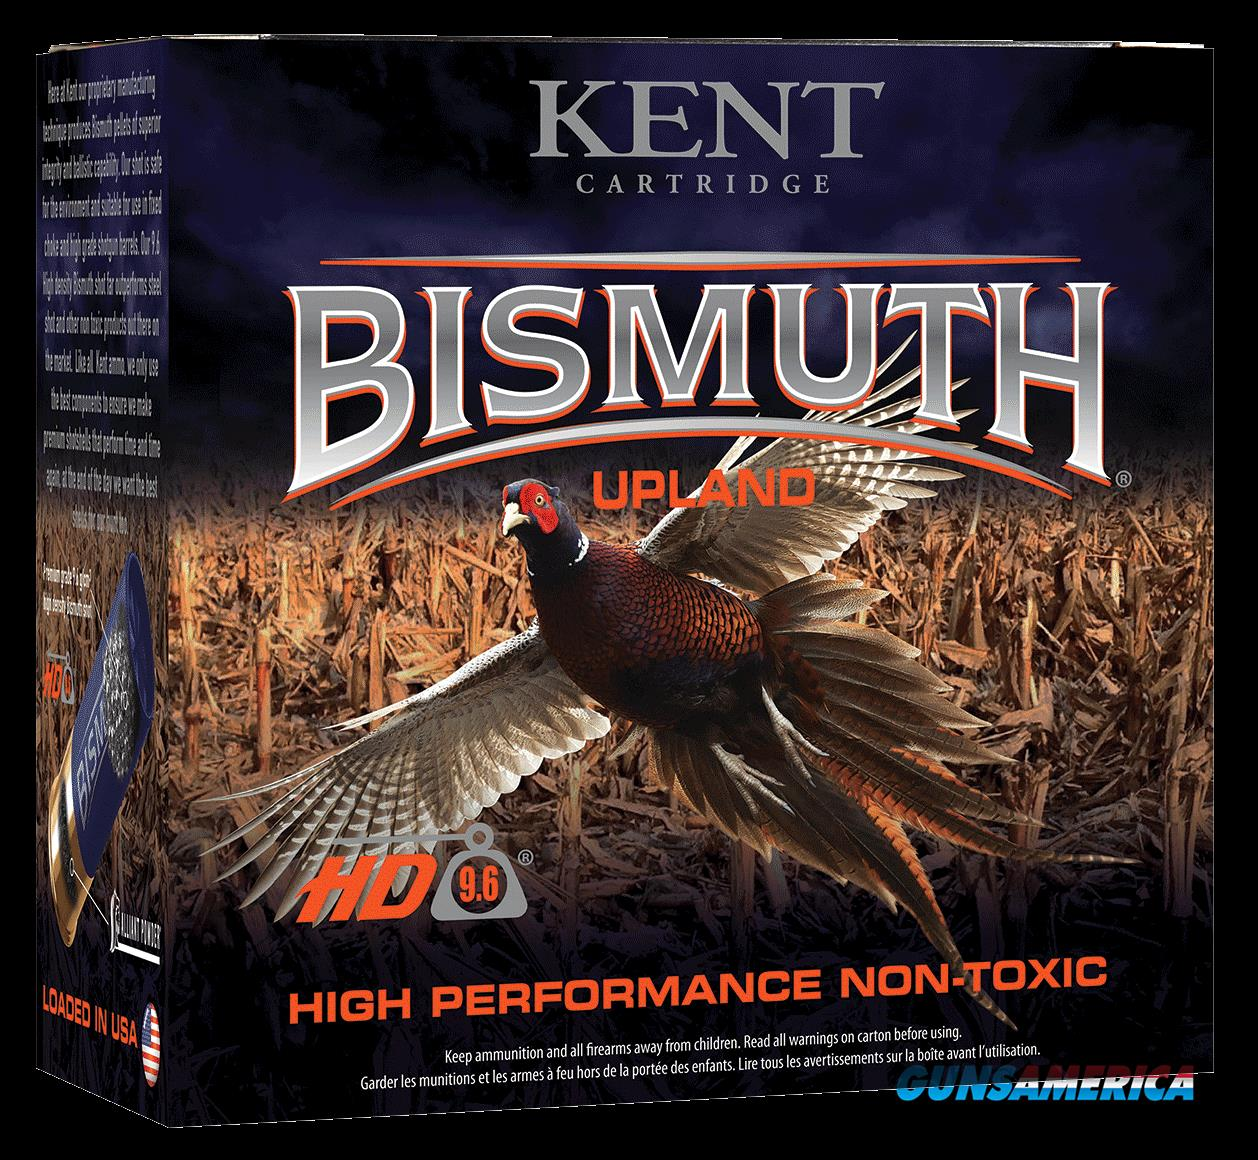 Kent Cartridge Bismuth, Kent B20u286    2.75  1oz  Bismt Upland      25-10  Guns > Pistols > 1911 Pistol Copies (non-Colt)